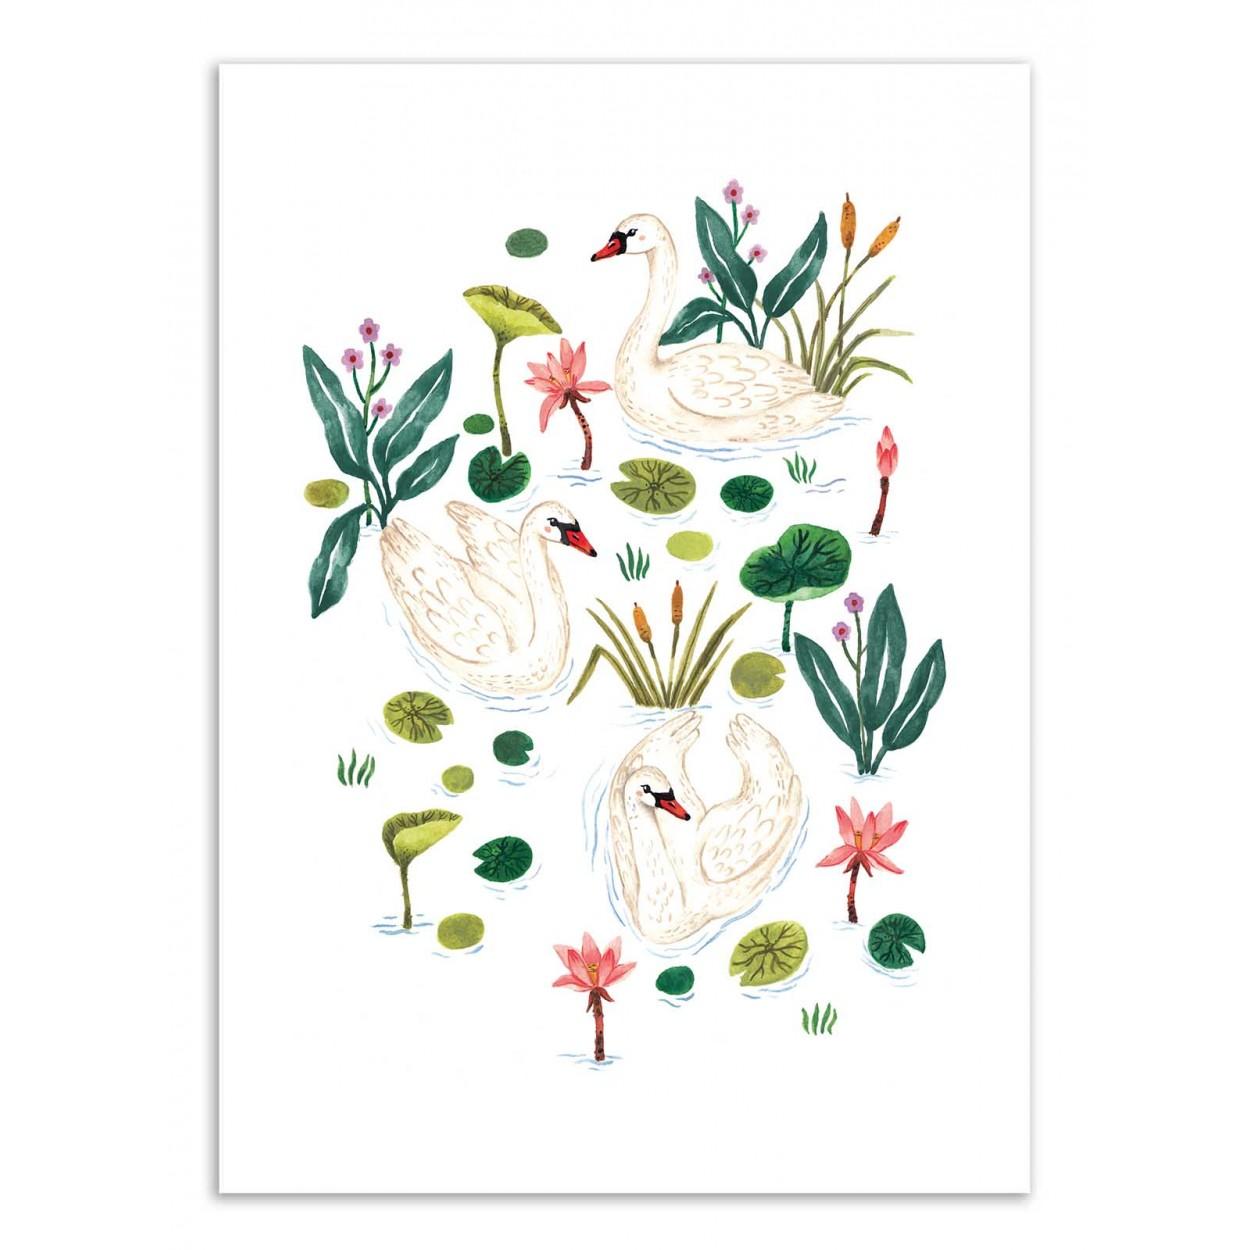 SWAN - Affiche d'art 50 x 70 cm